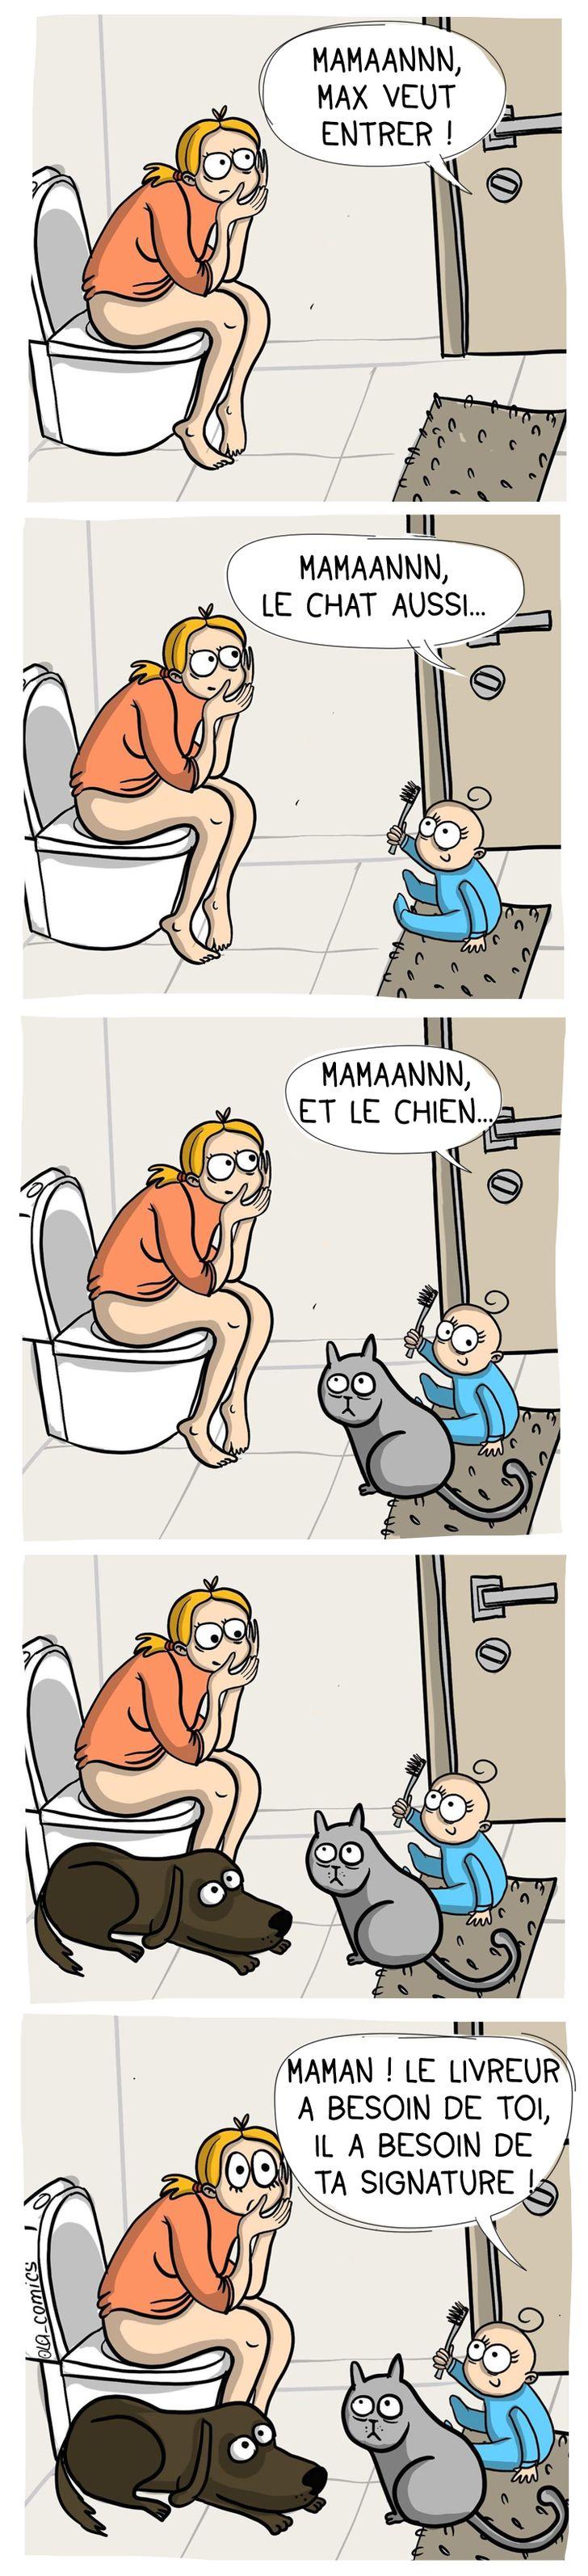 Olga Alekseeva : Les toilettes version maman